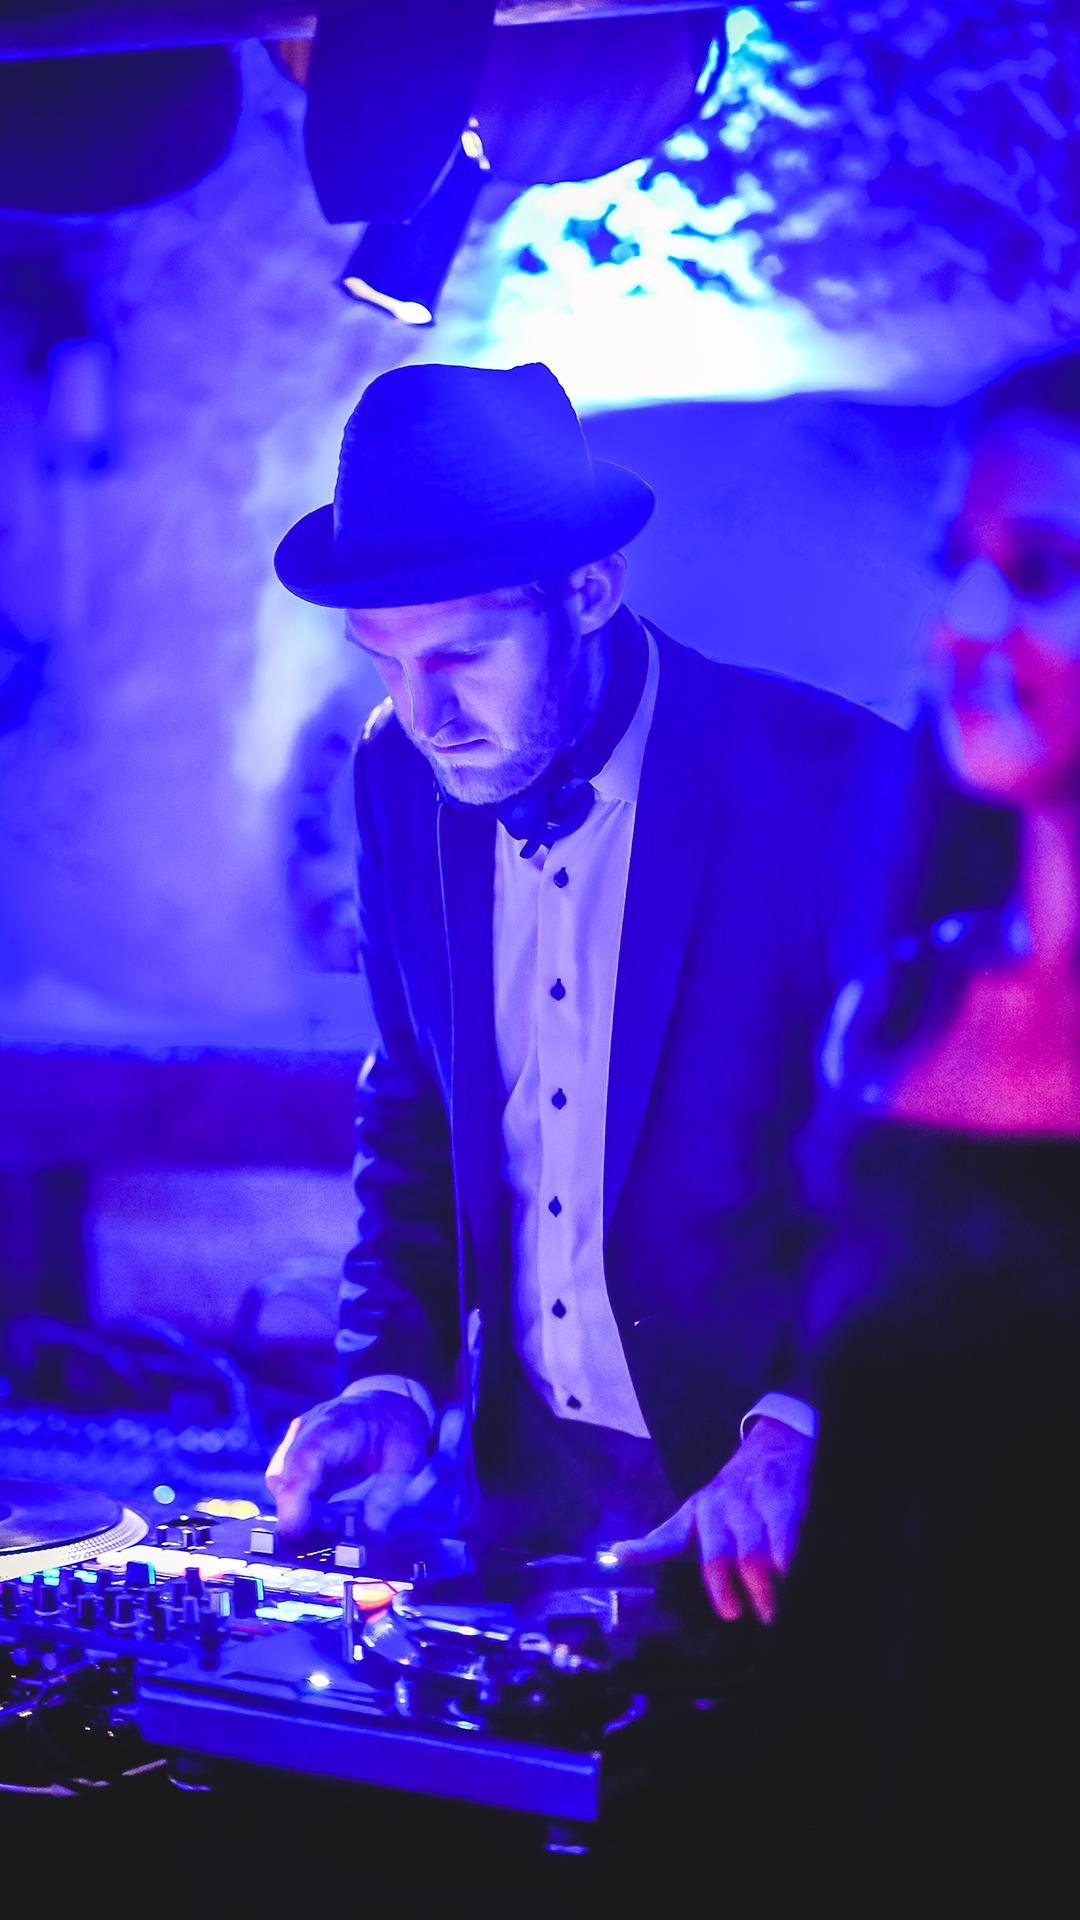 DJ-Neils-plus-Live-Acts-Eventband-Eventact-Online-Live-2021-04